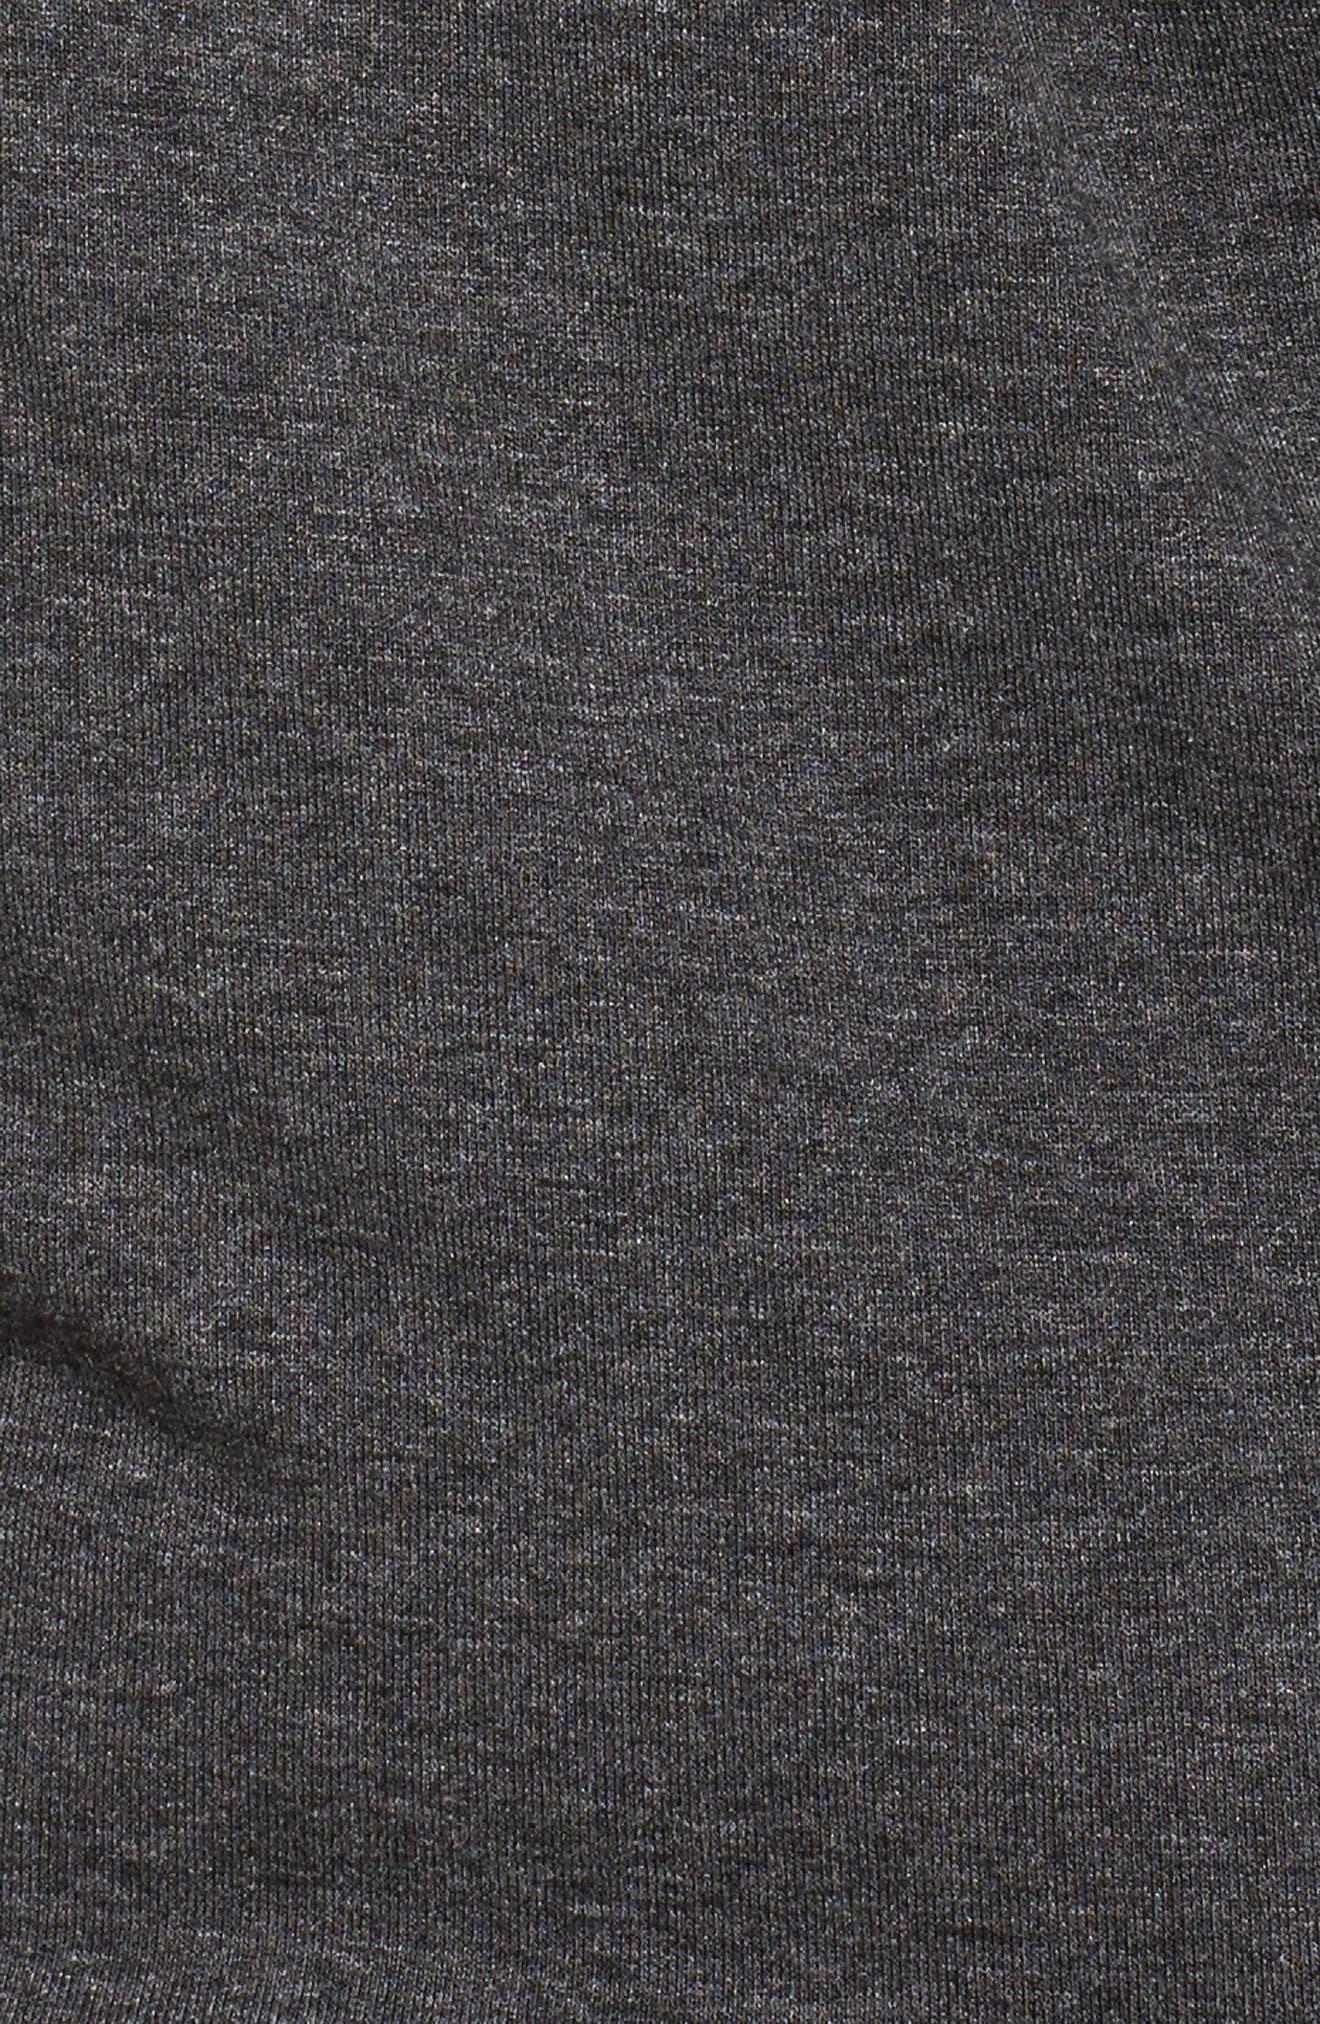 Slit Sleeve Knit Sheath Dress,                             Alternate thumbnail 10, color,